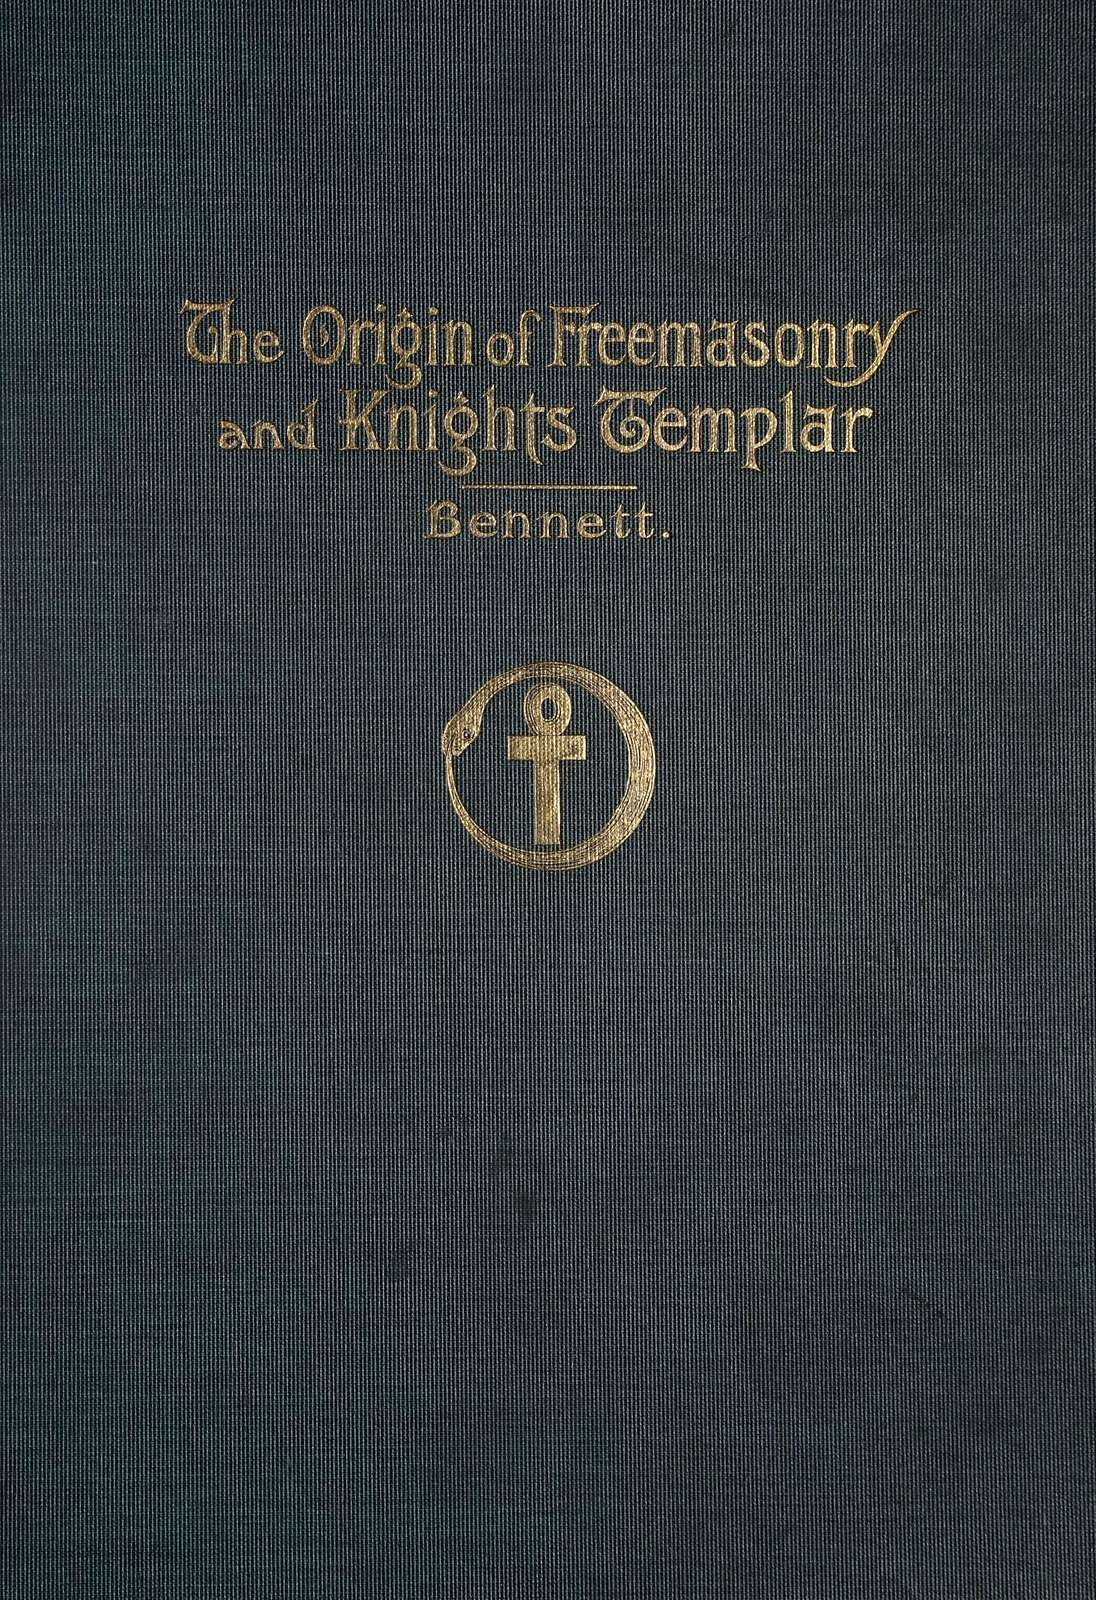 The origin of freemasonry and Knights templar,